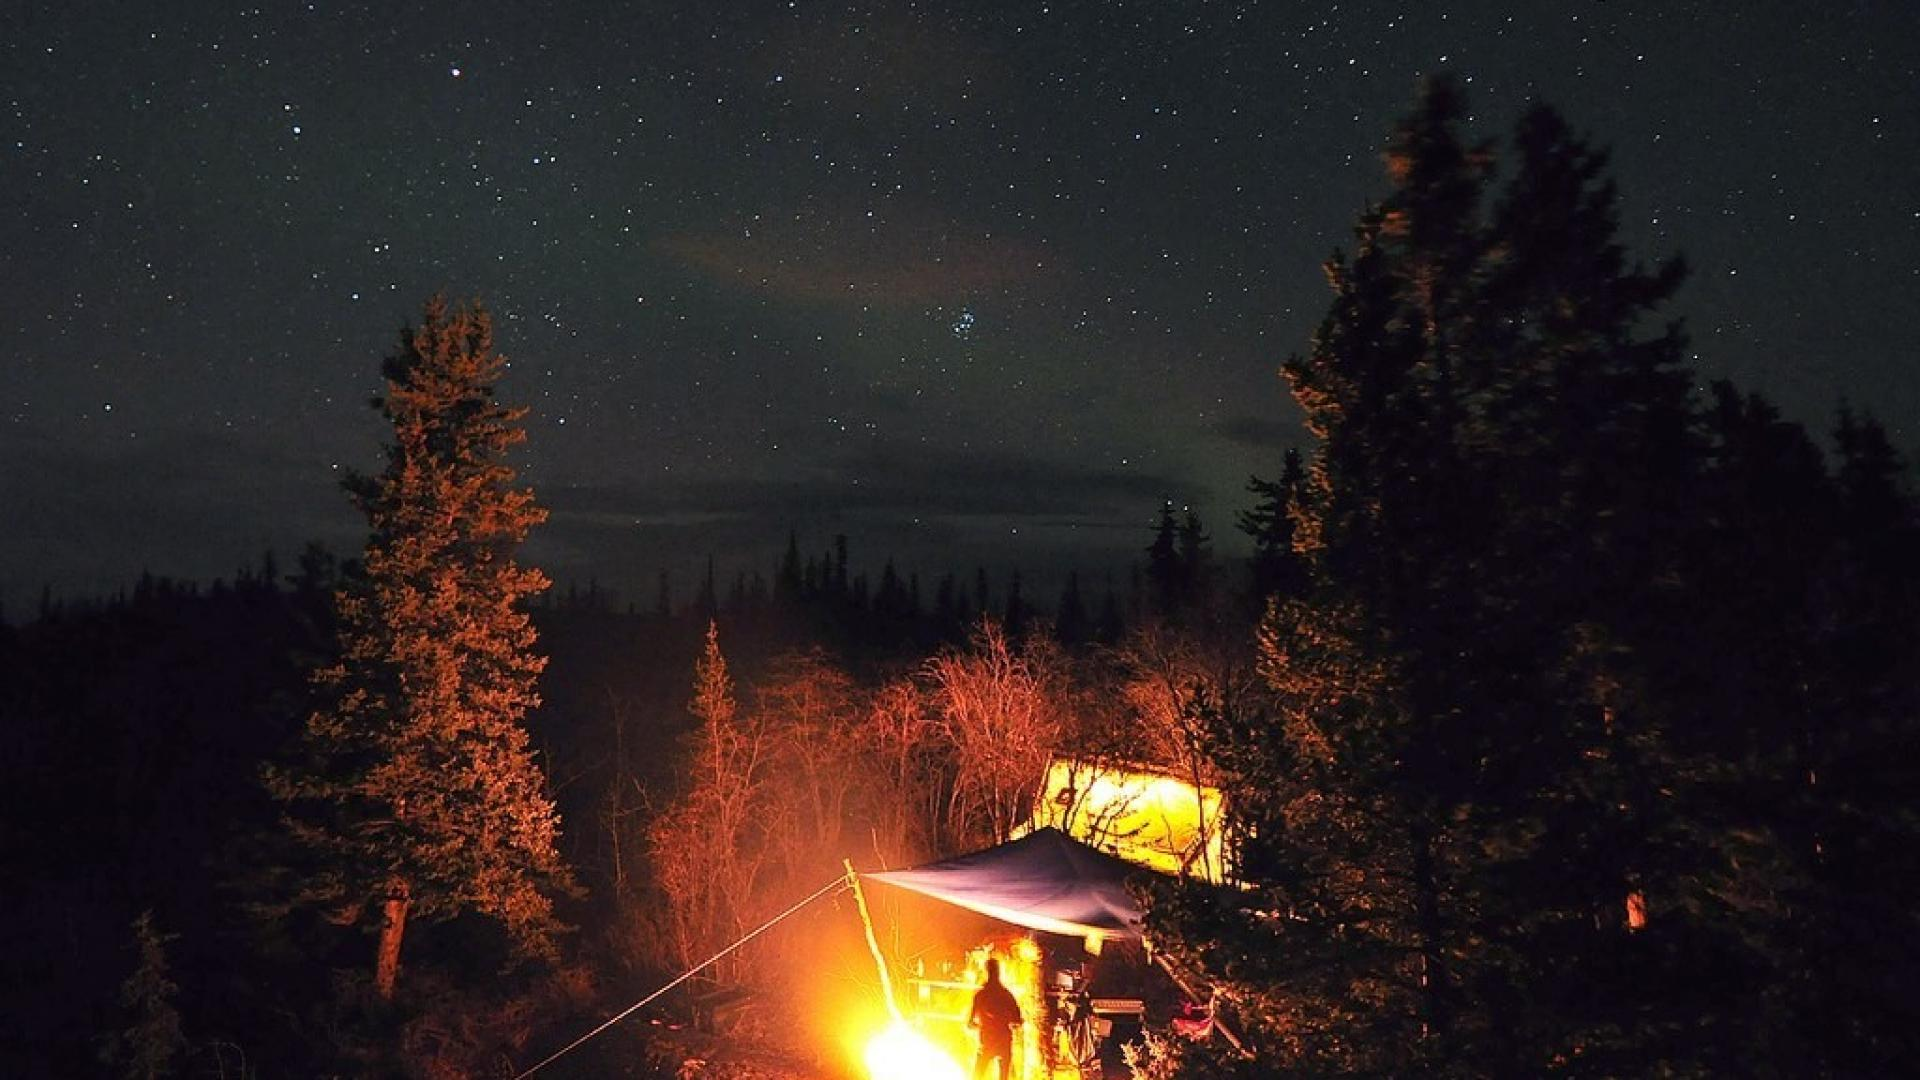 Trees stars fire tents camping tent wallpaper 58080 1920x1080